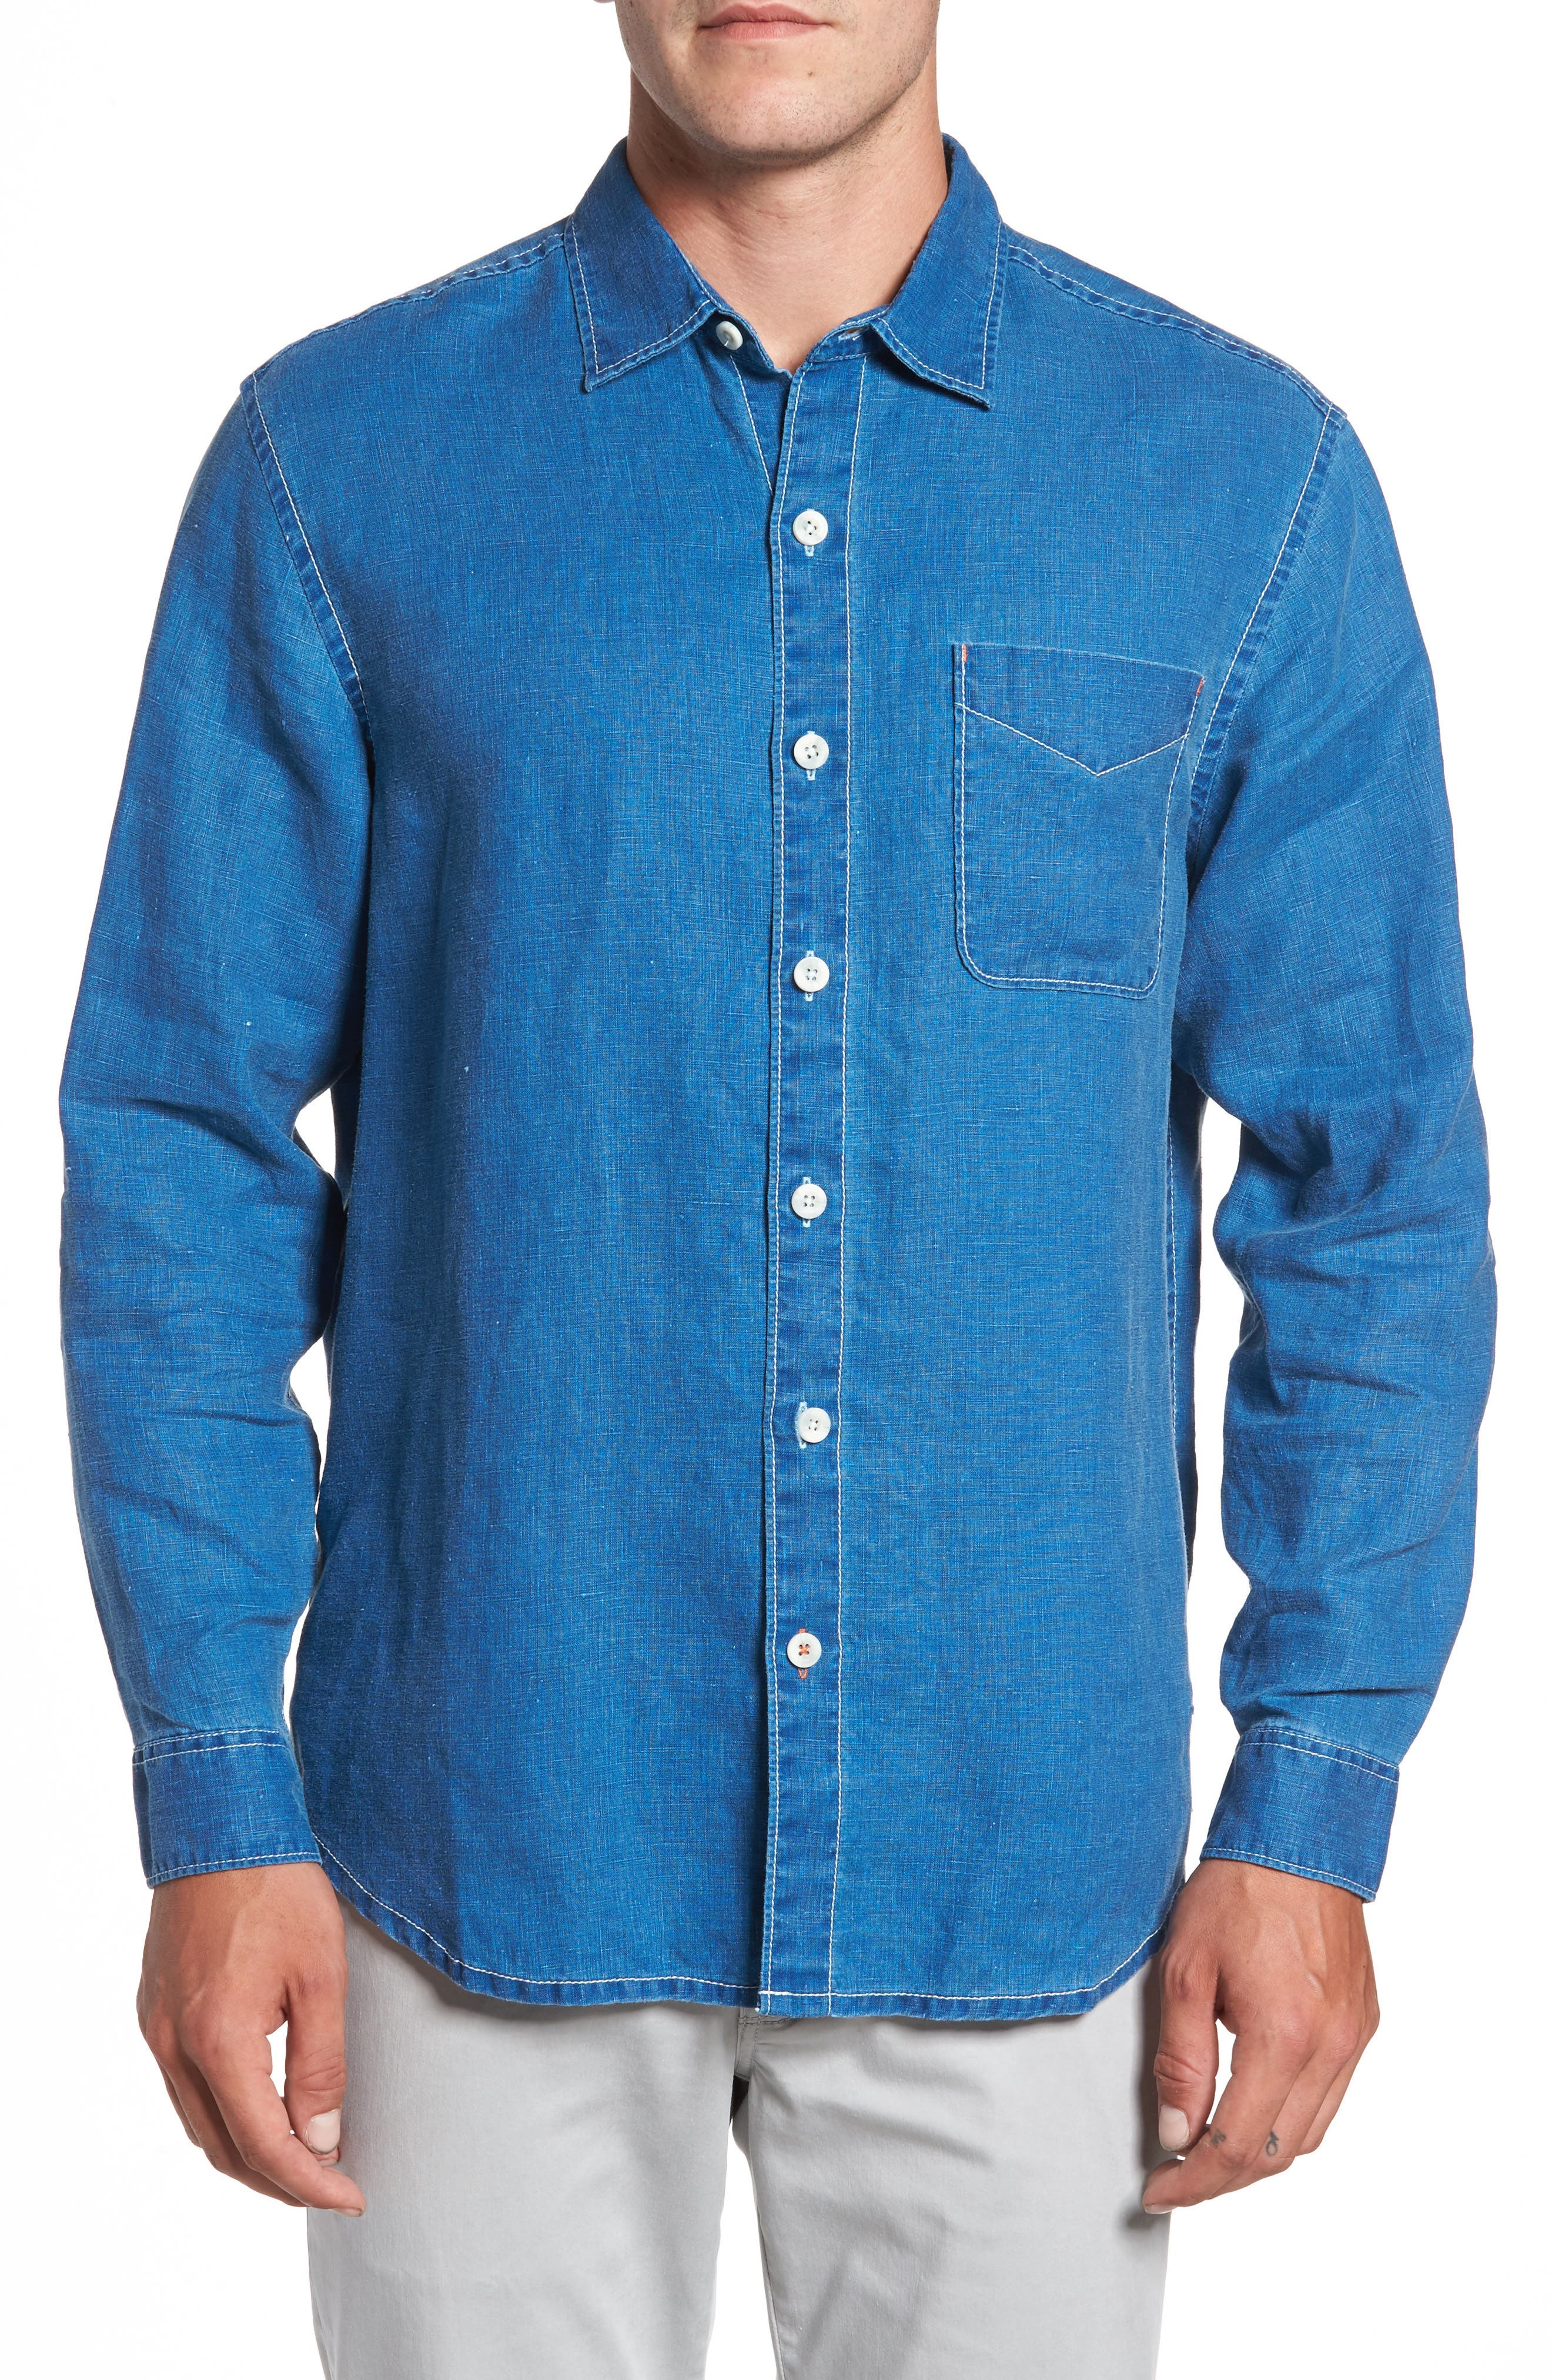 Main Image - Tommy Bahama Sea Glass Breezer Linen Sport Shirt